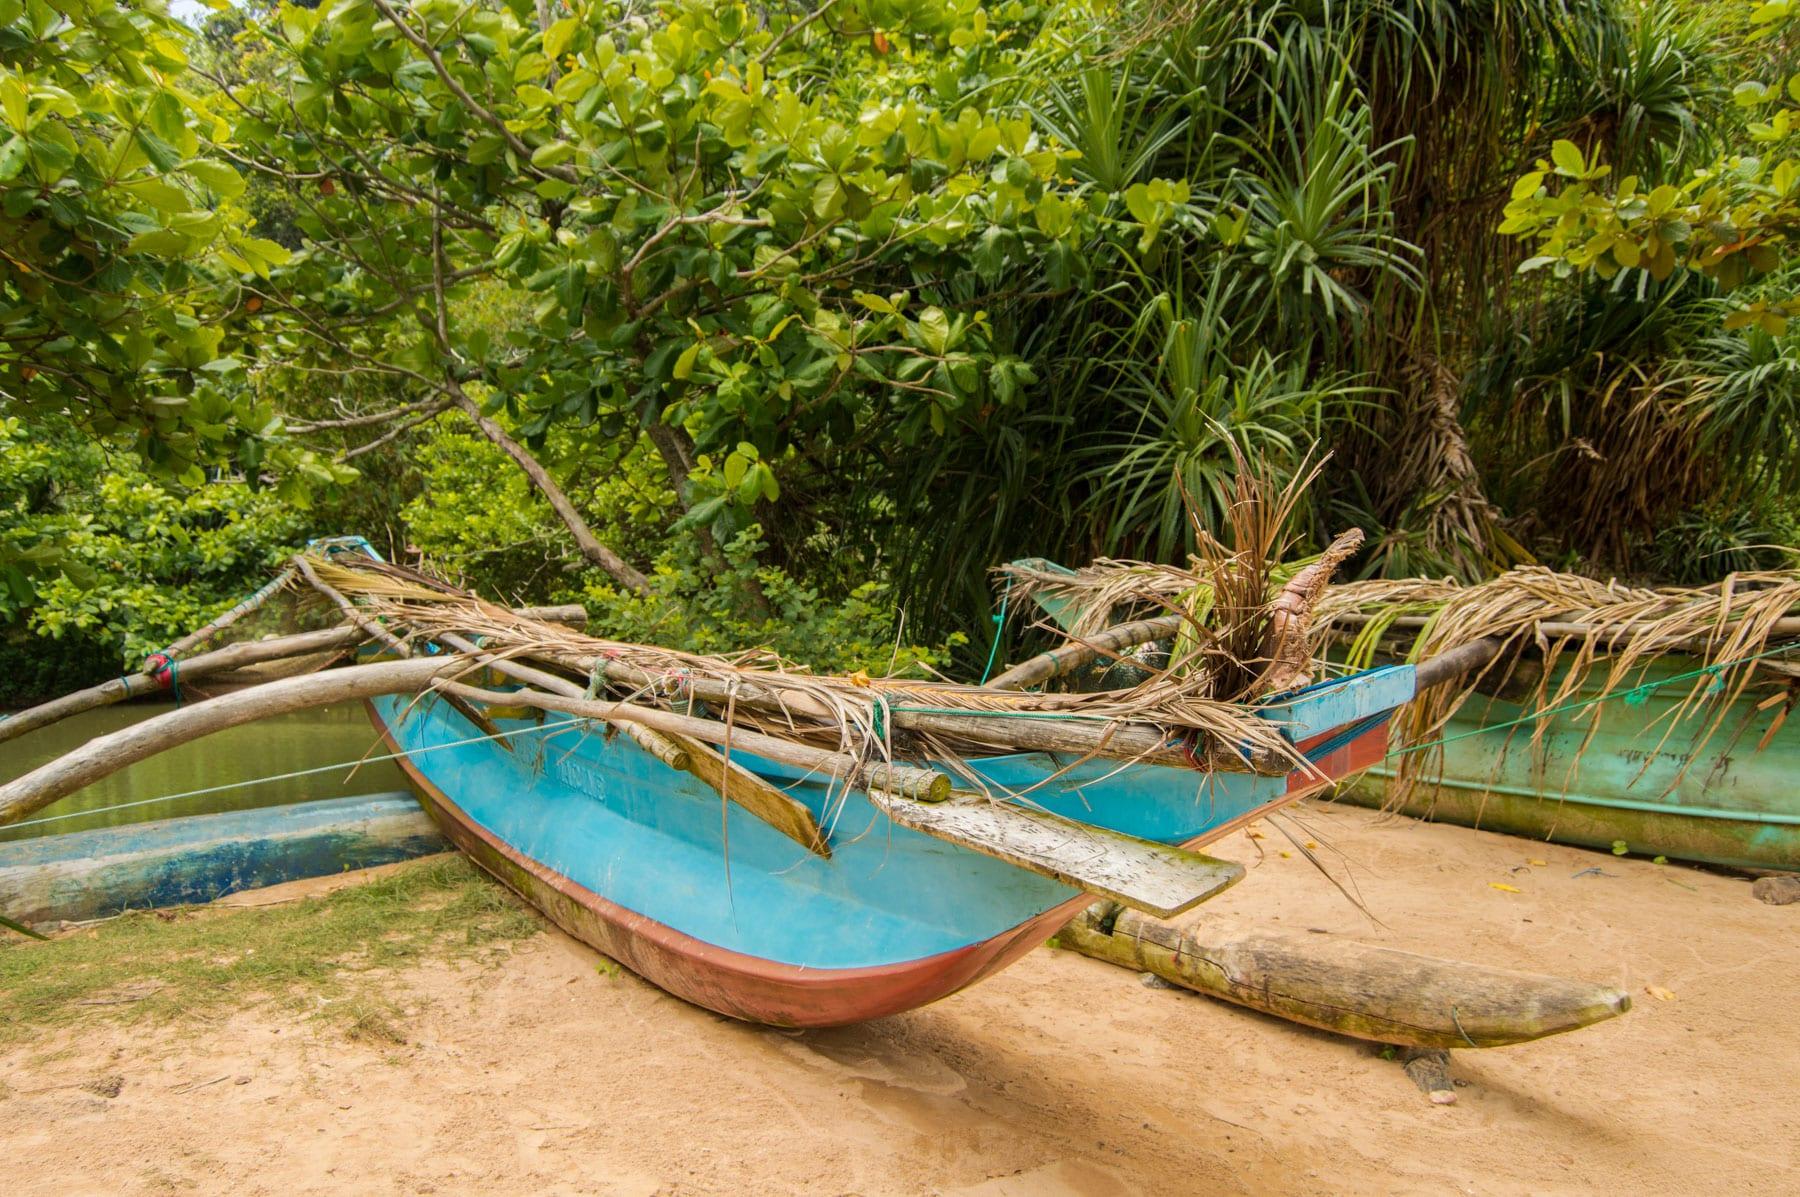 Jungle Beach as a calmer option is definitely one of the best beaches in Sri Lanka!